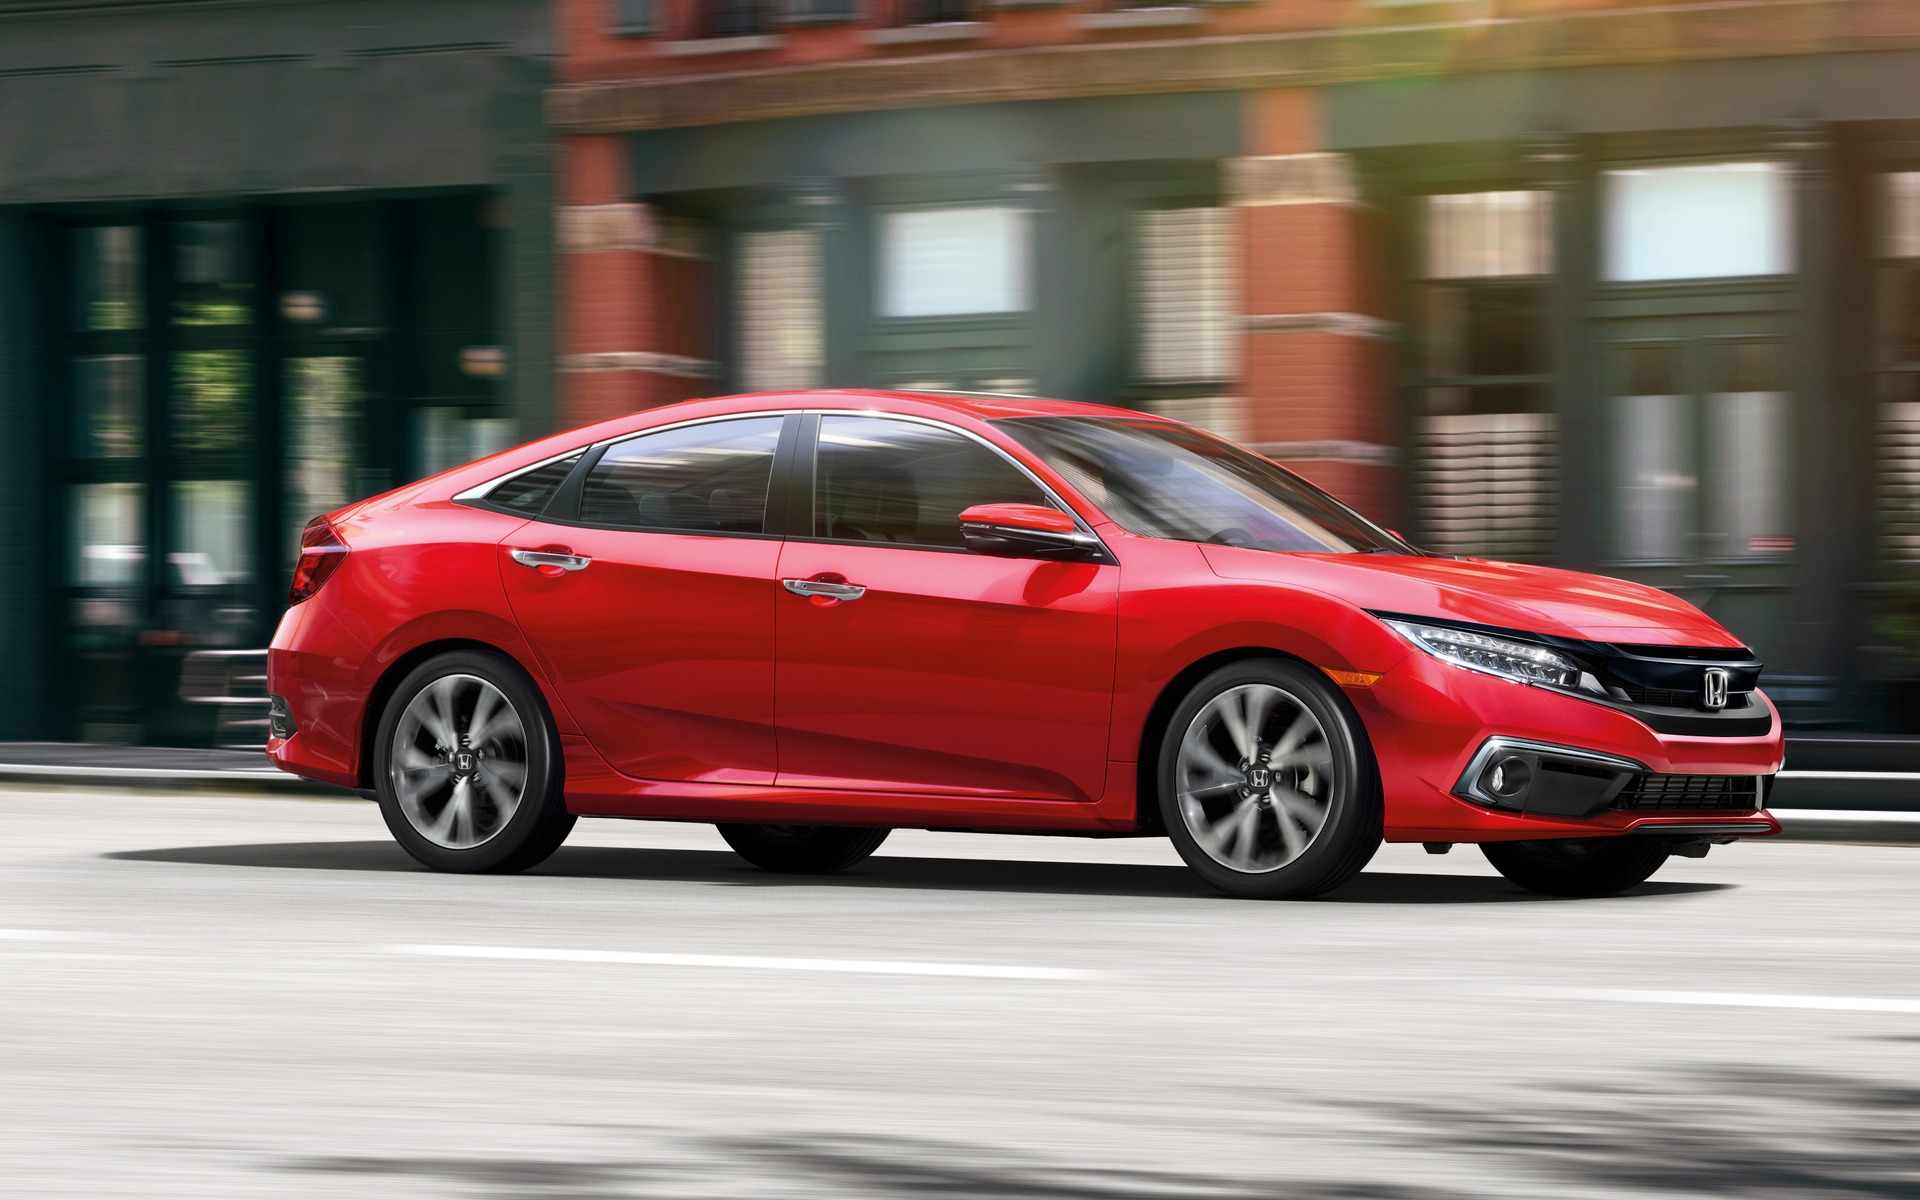 Honda S Big Bold Plan Includes Fewer Models New Global Platform The Car Guide